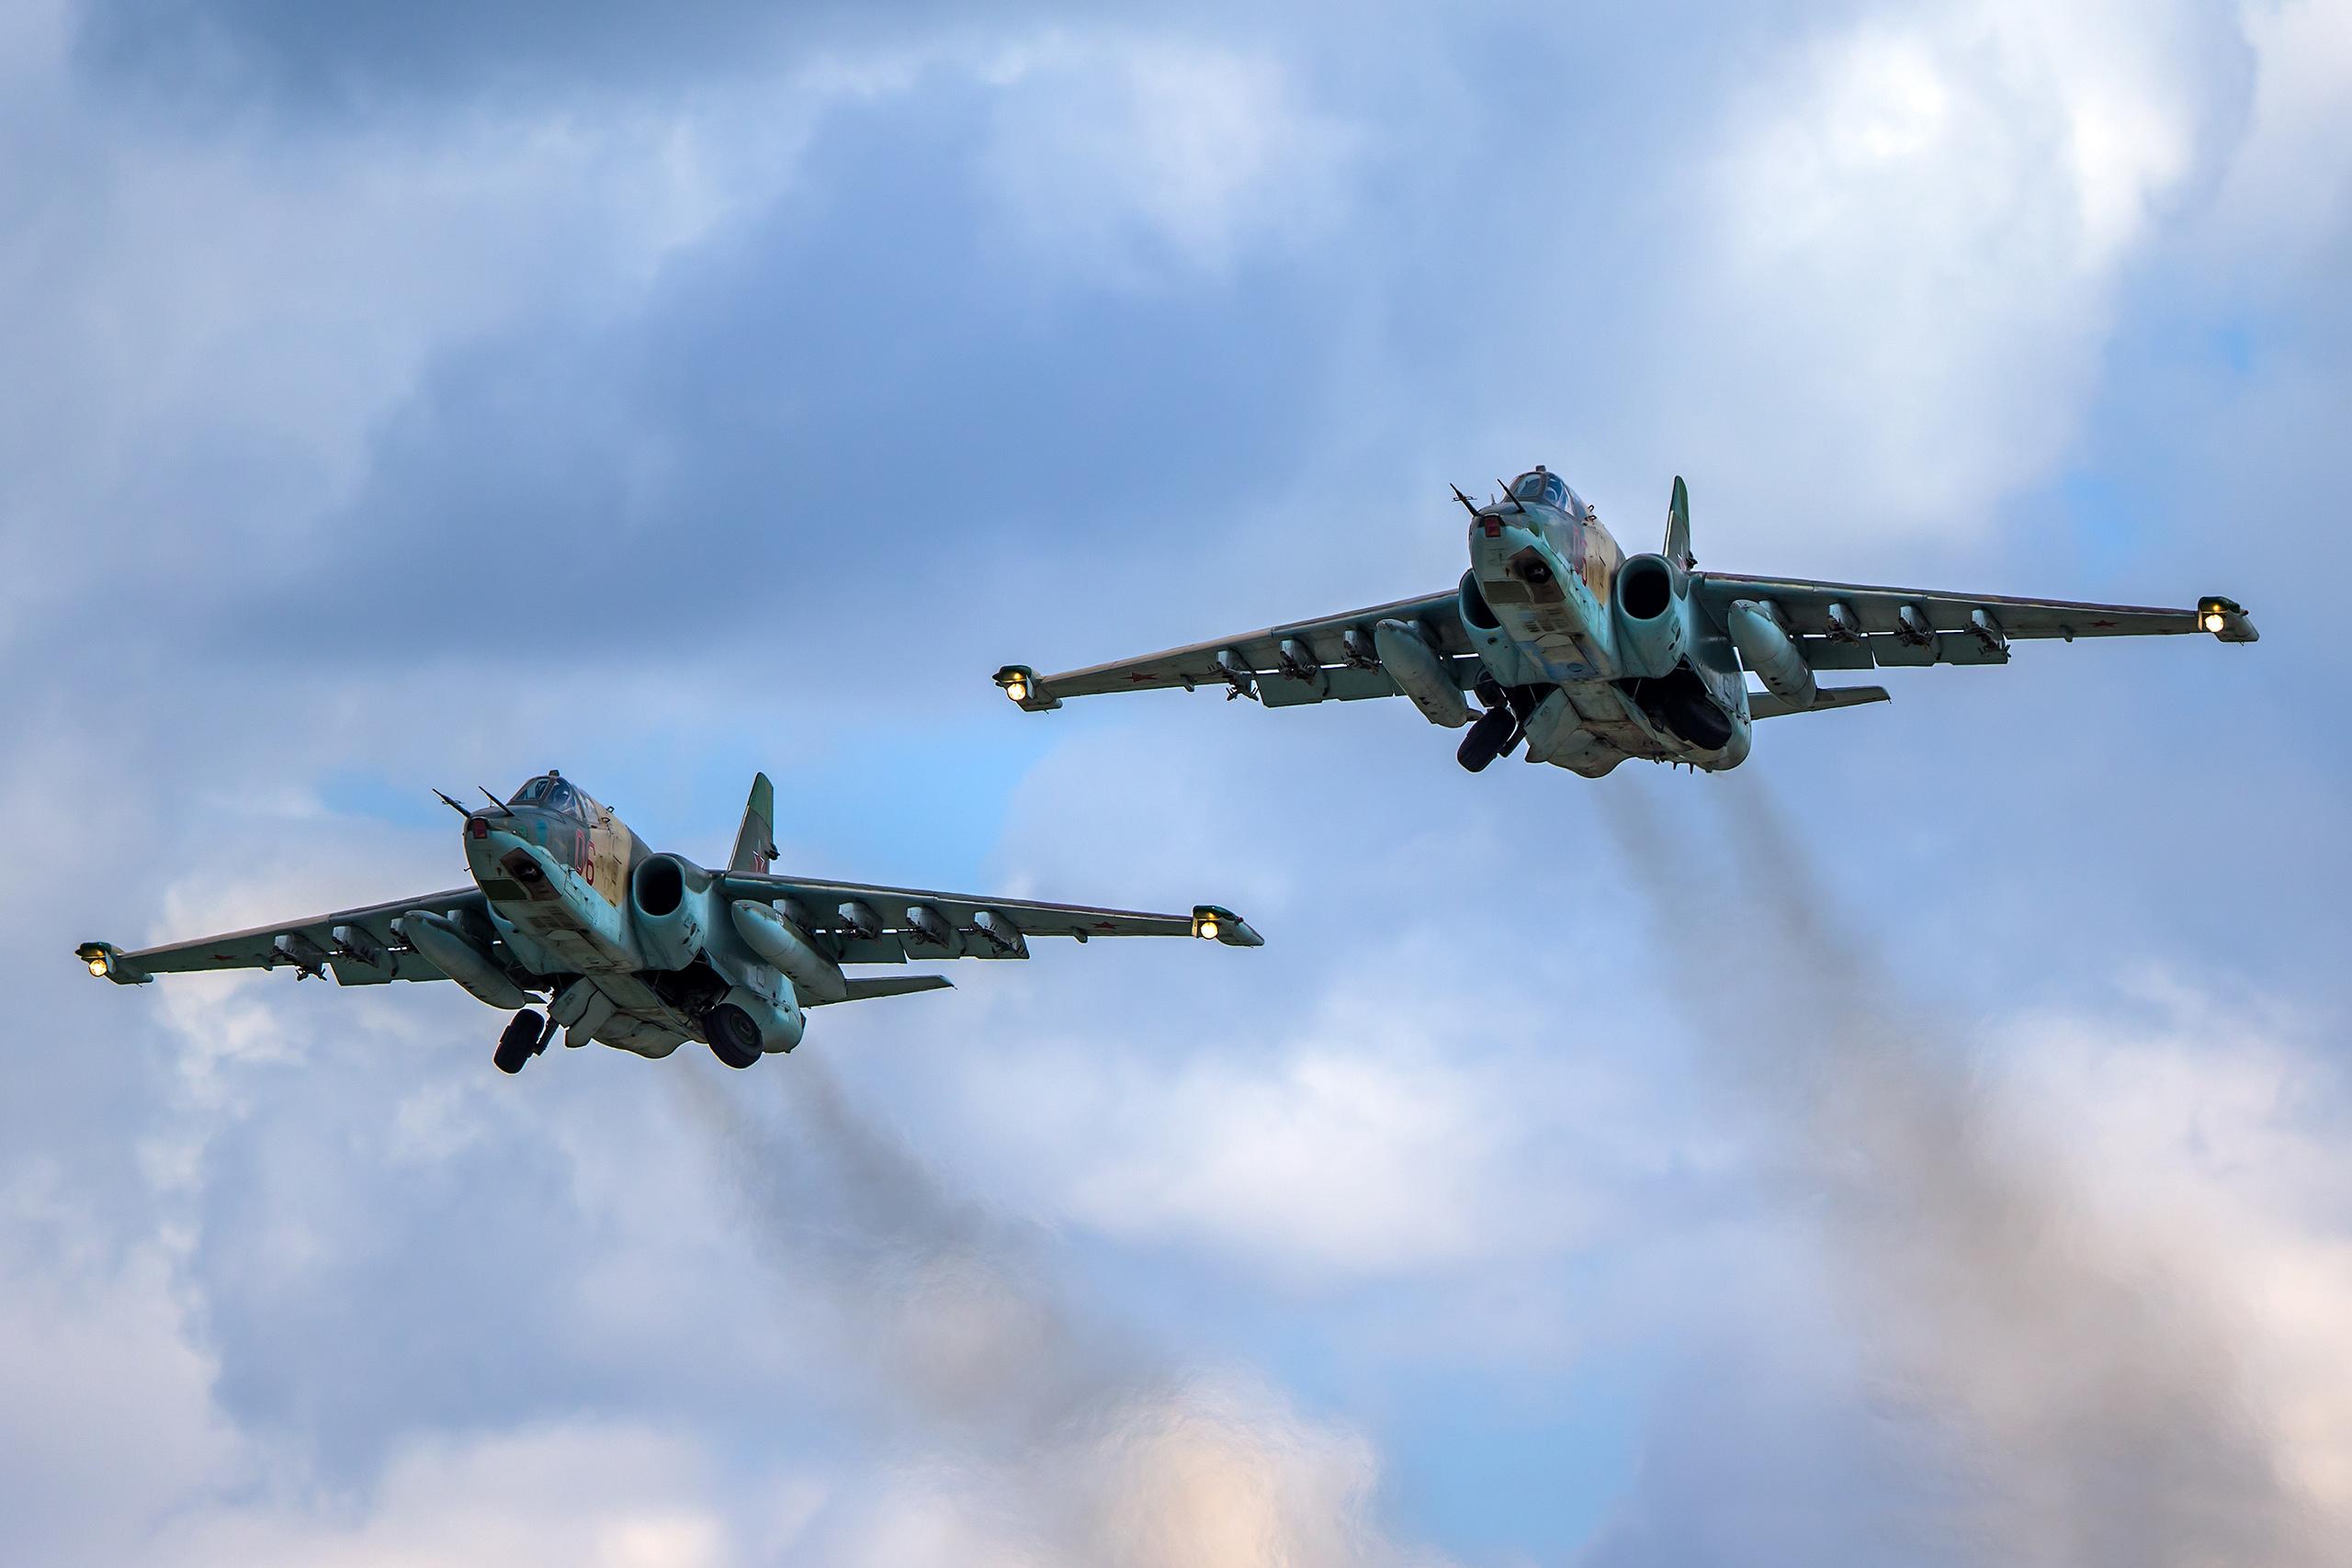 Airplane_Sukhoi_Su-25_438671.jpg